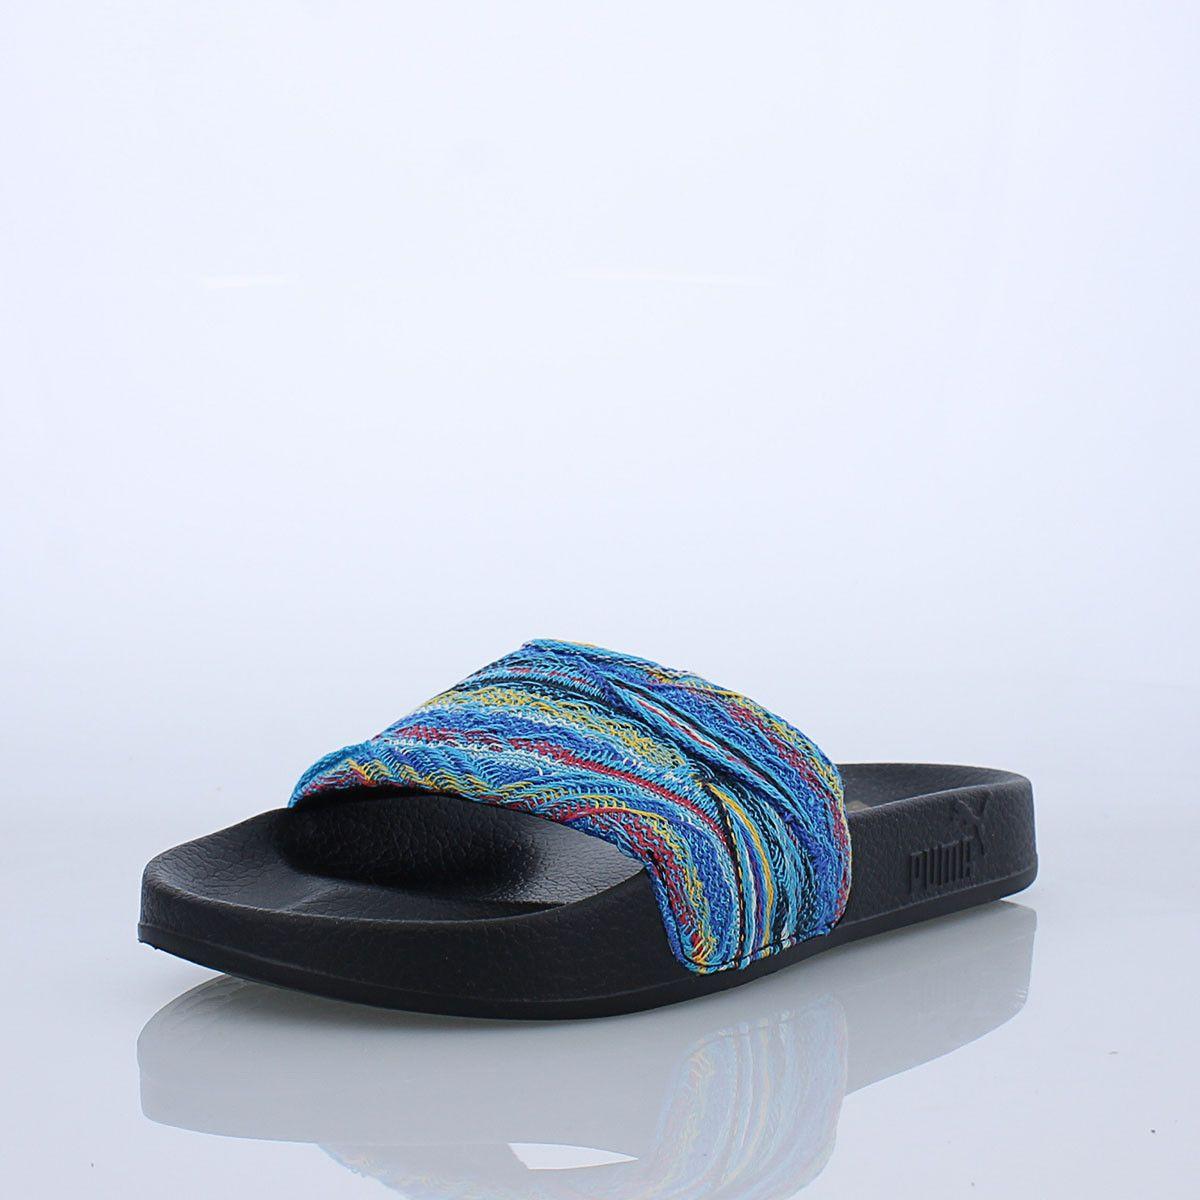 96c30b0ae5 PUMA X COOGI Leadcat (W) | PUMA for her | Street style, Sandals, Style